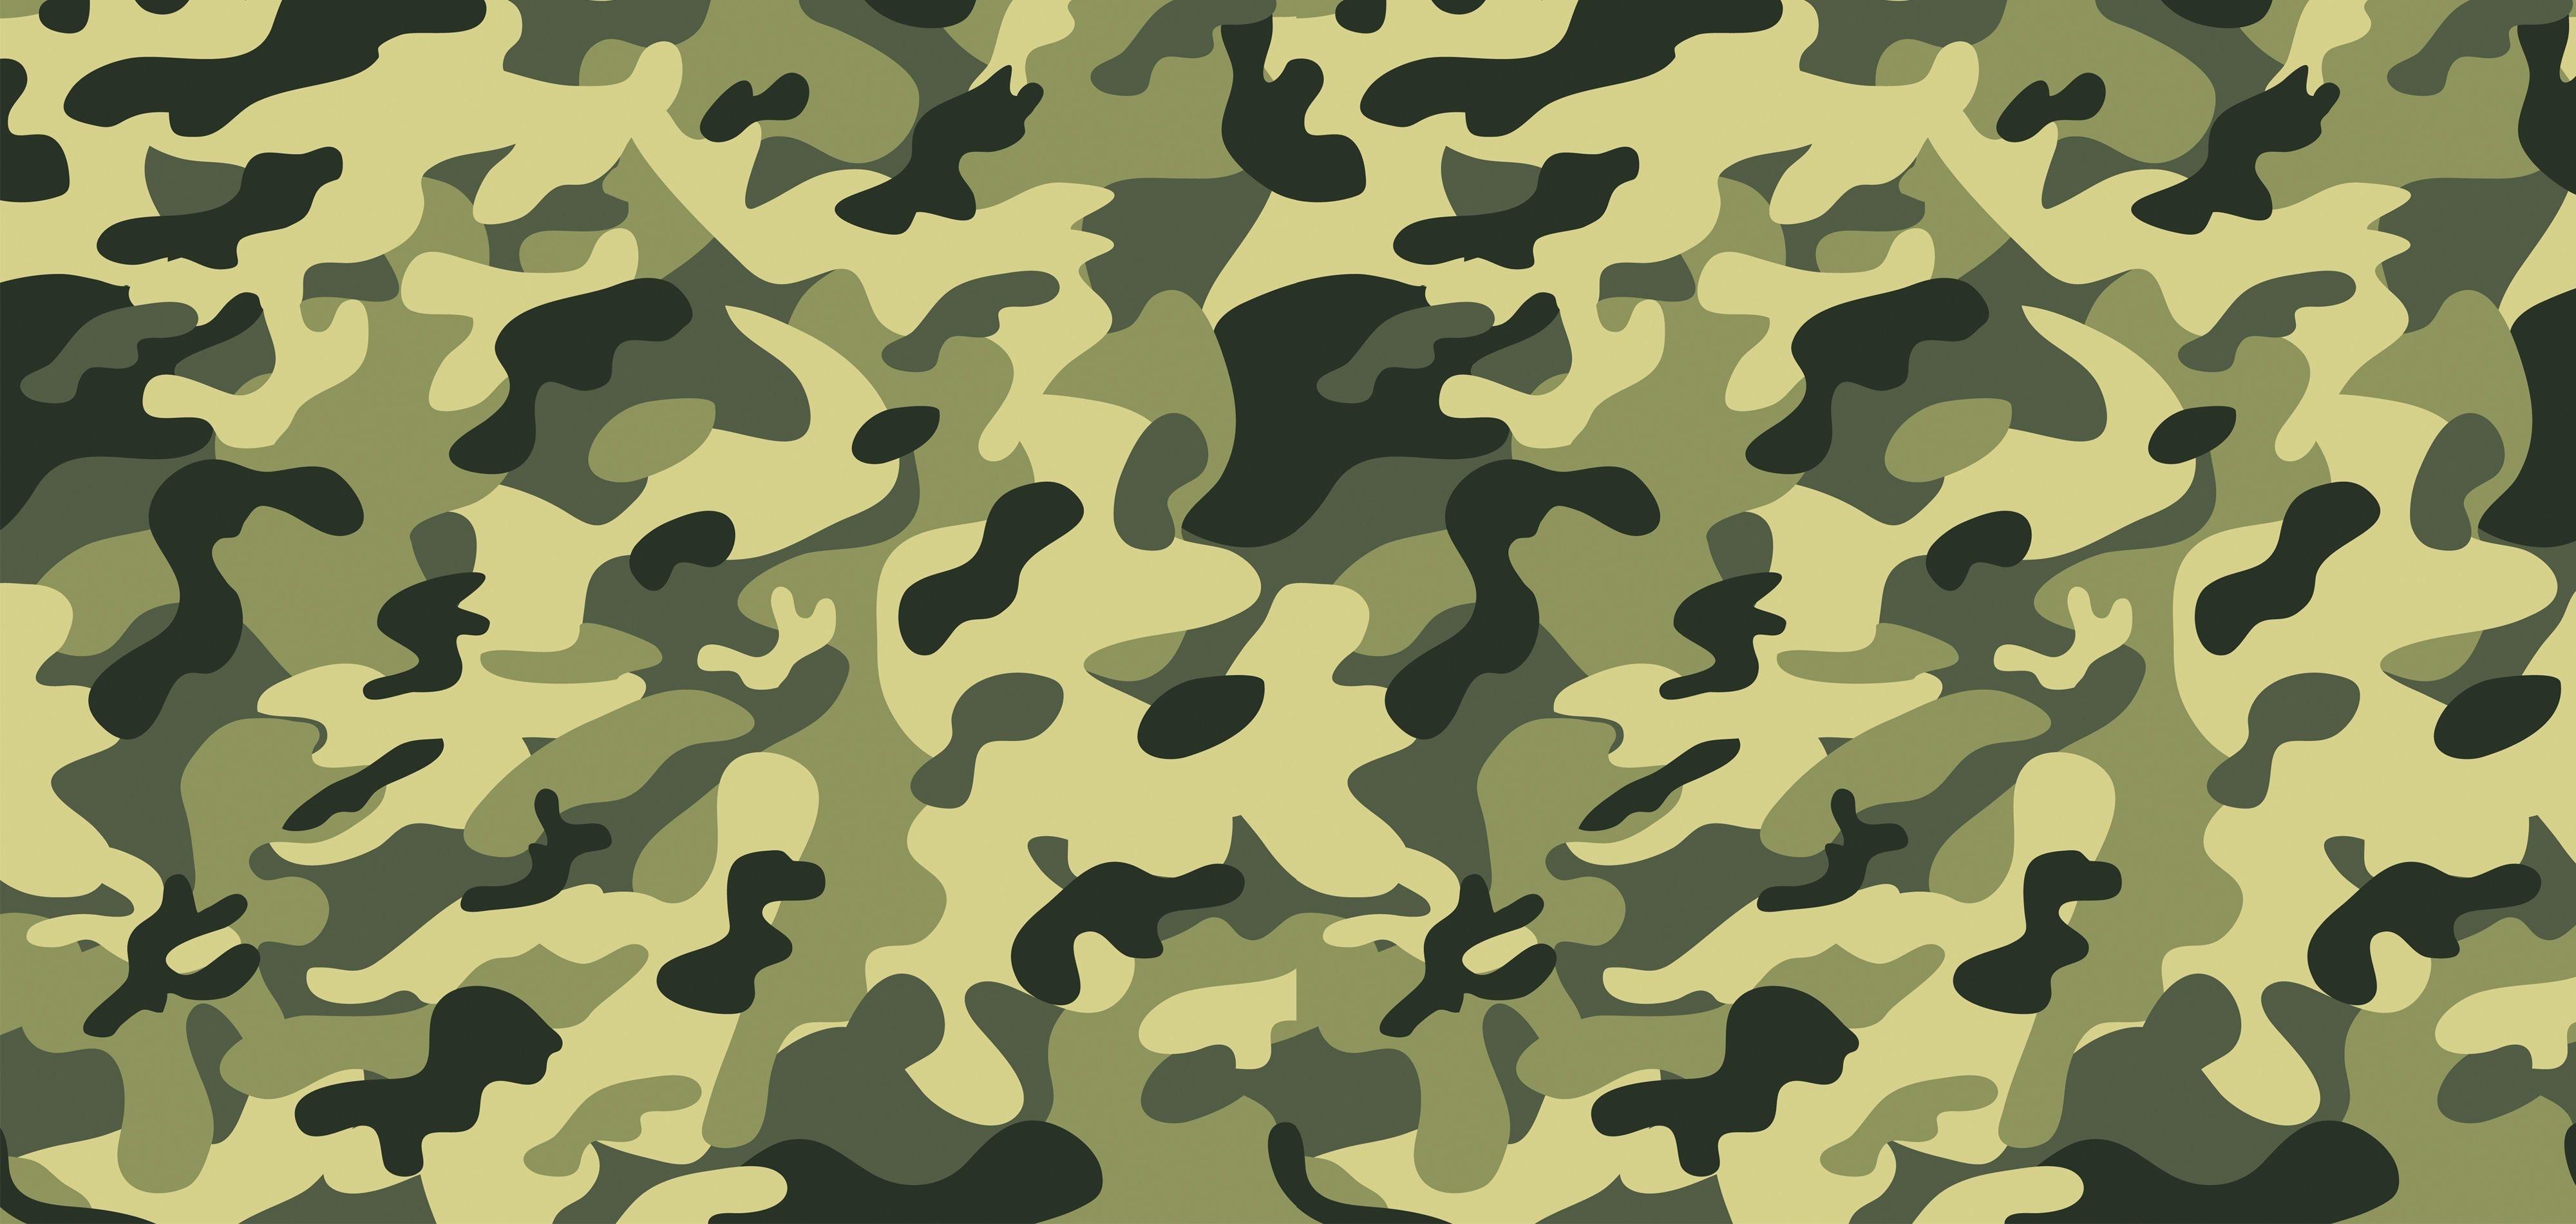 54+] Free Army Camo Wallpaper on WallpaperSafari.